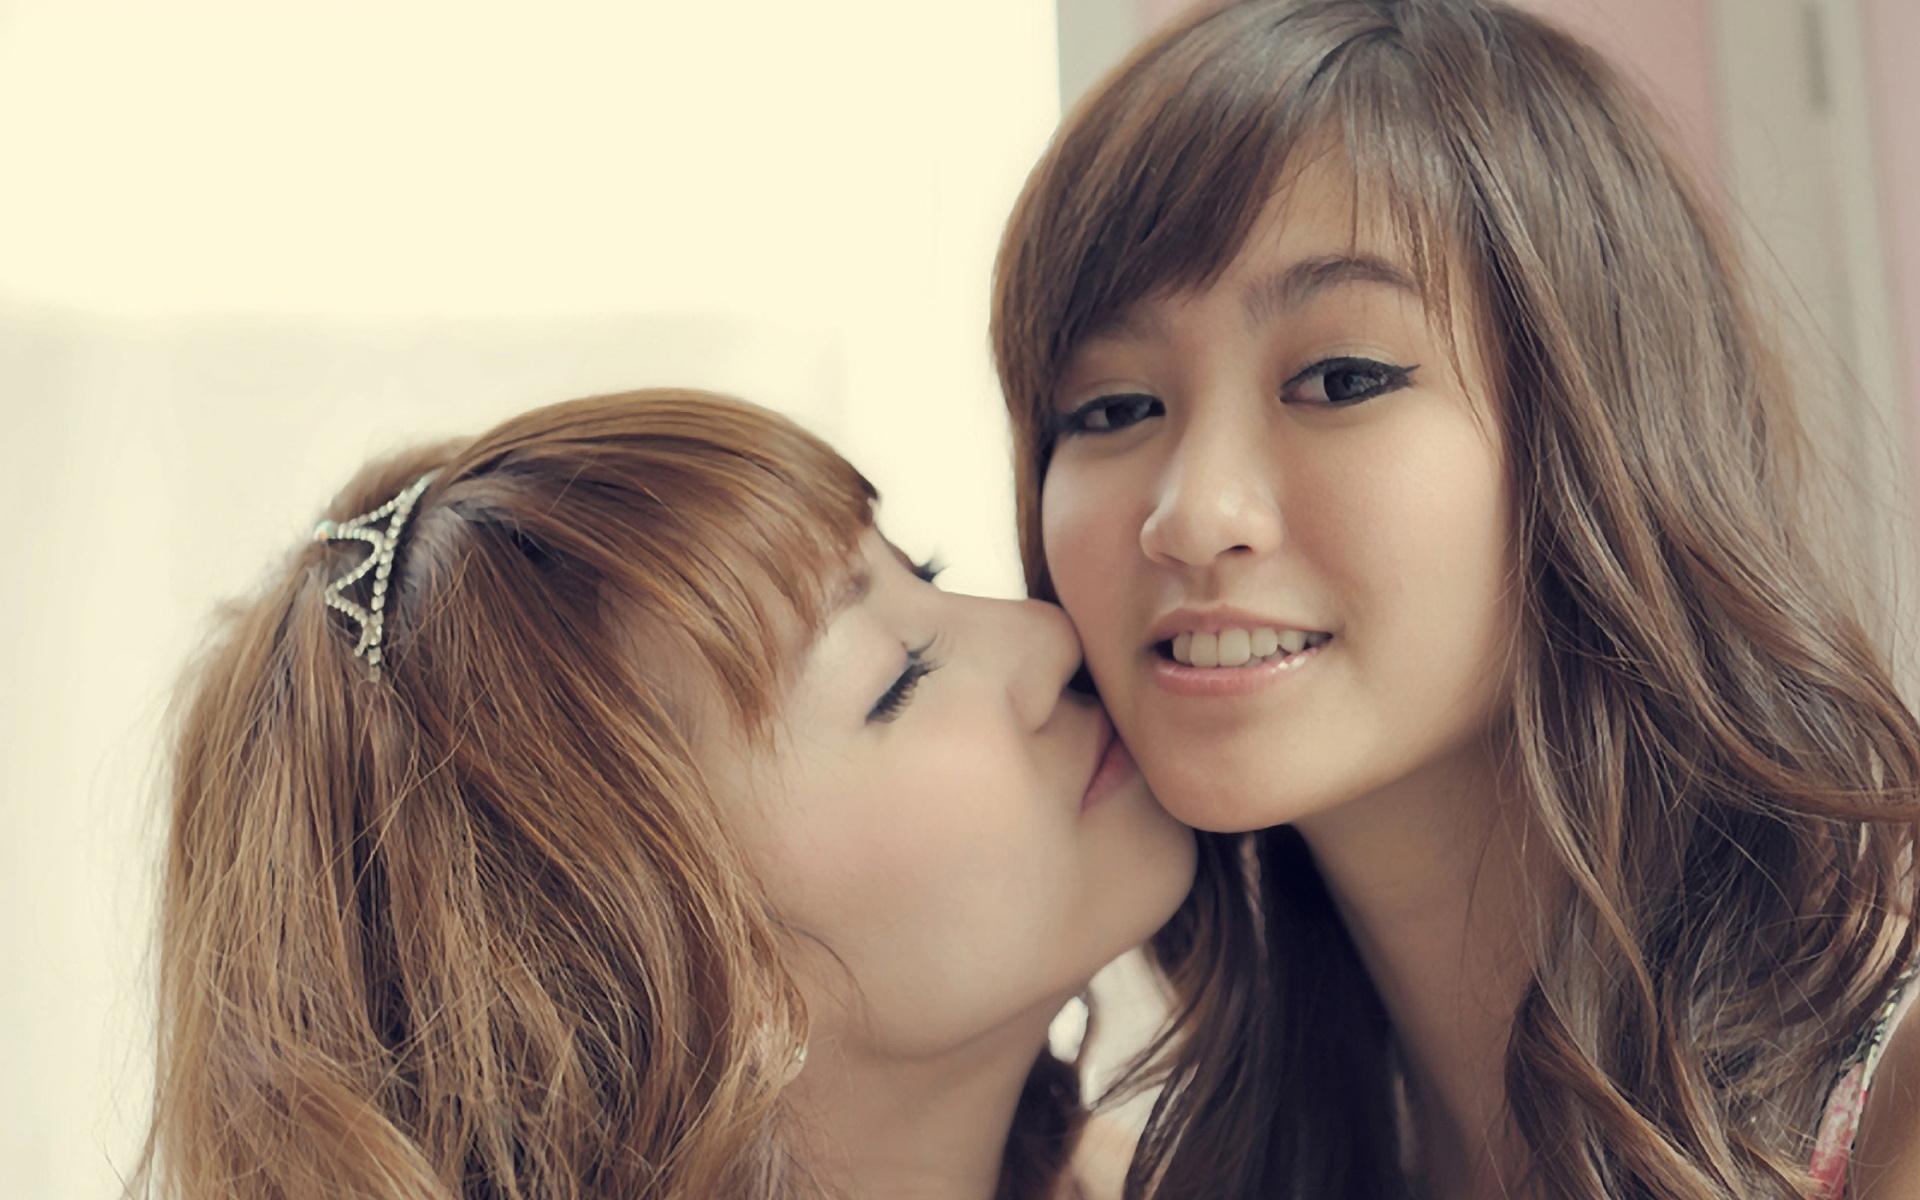 Asian girls kiss — pic 13